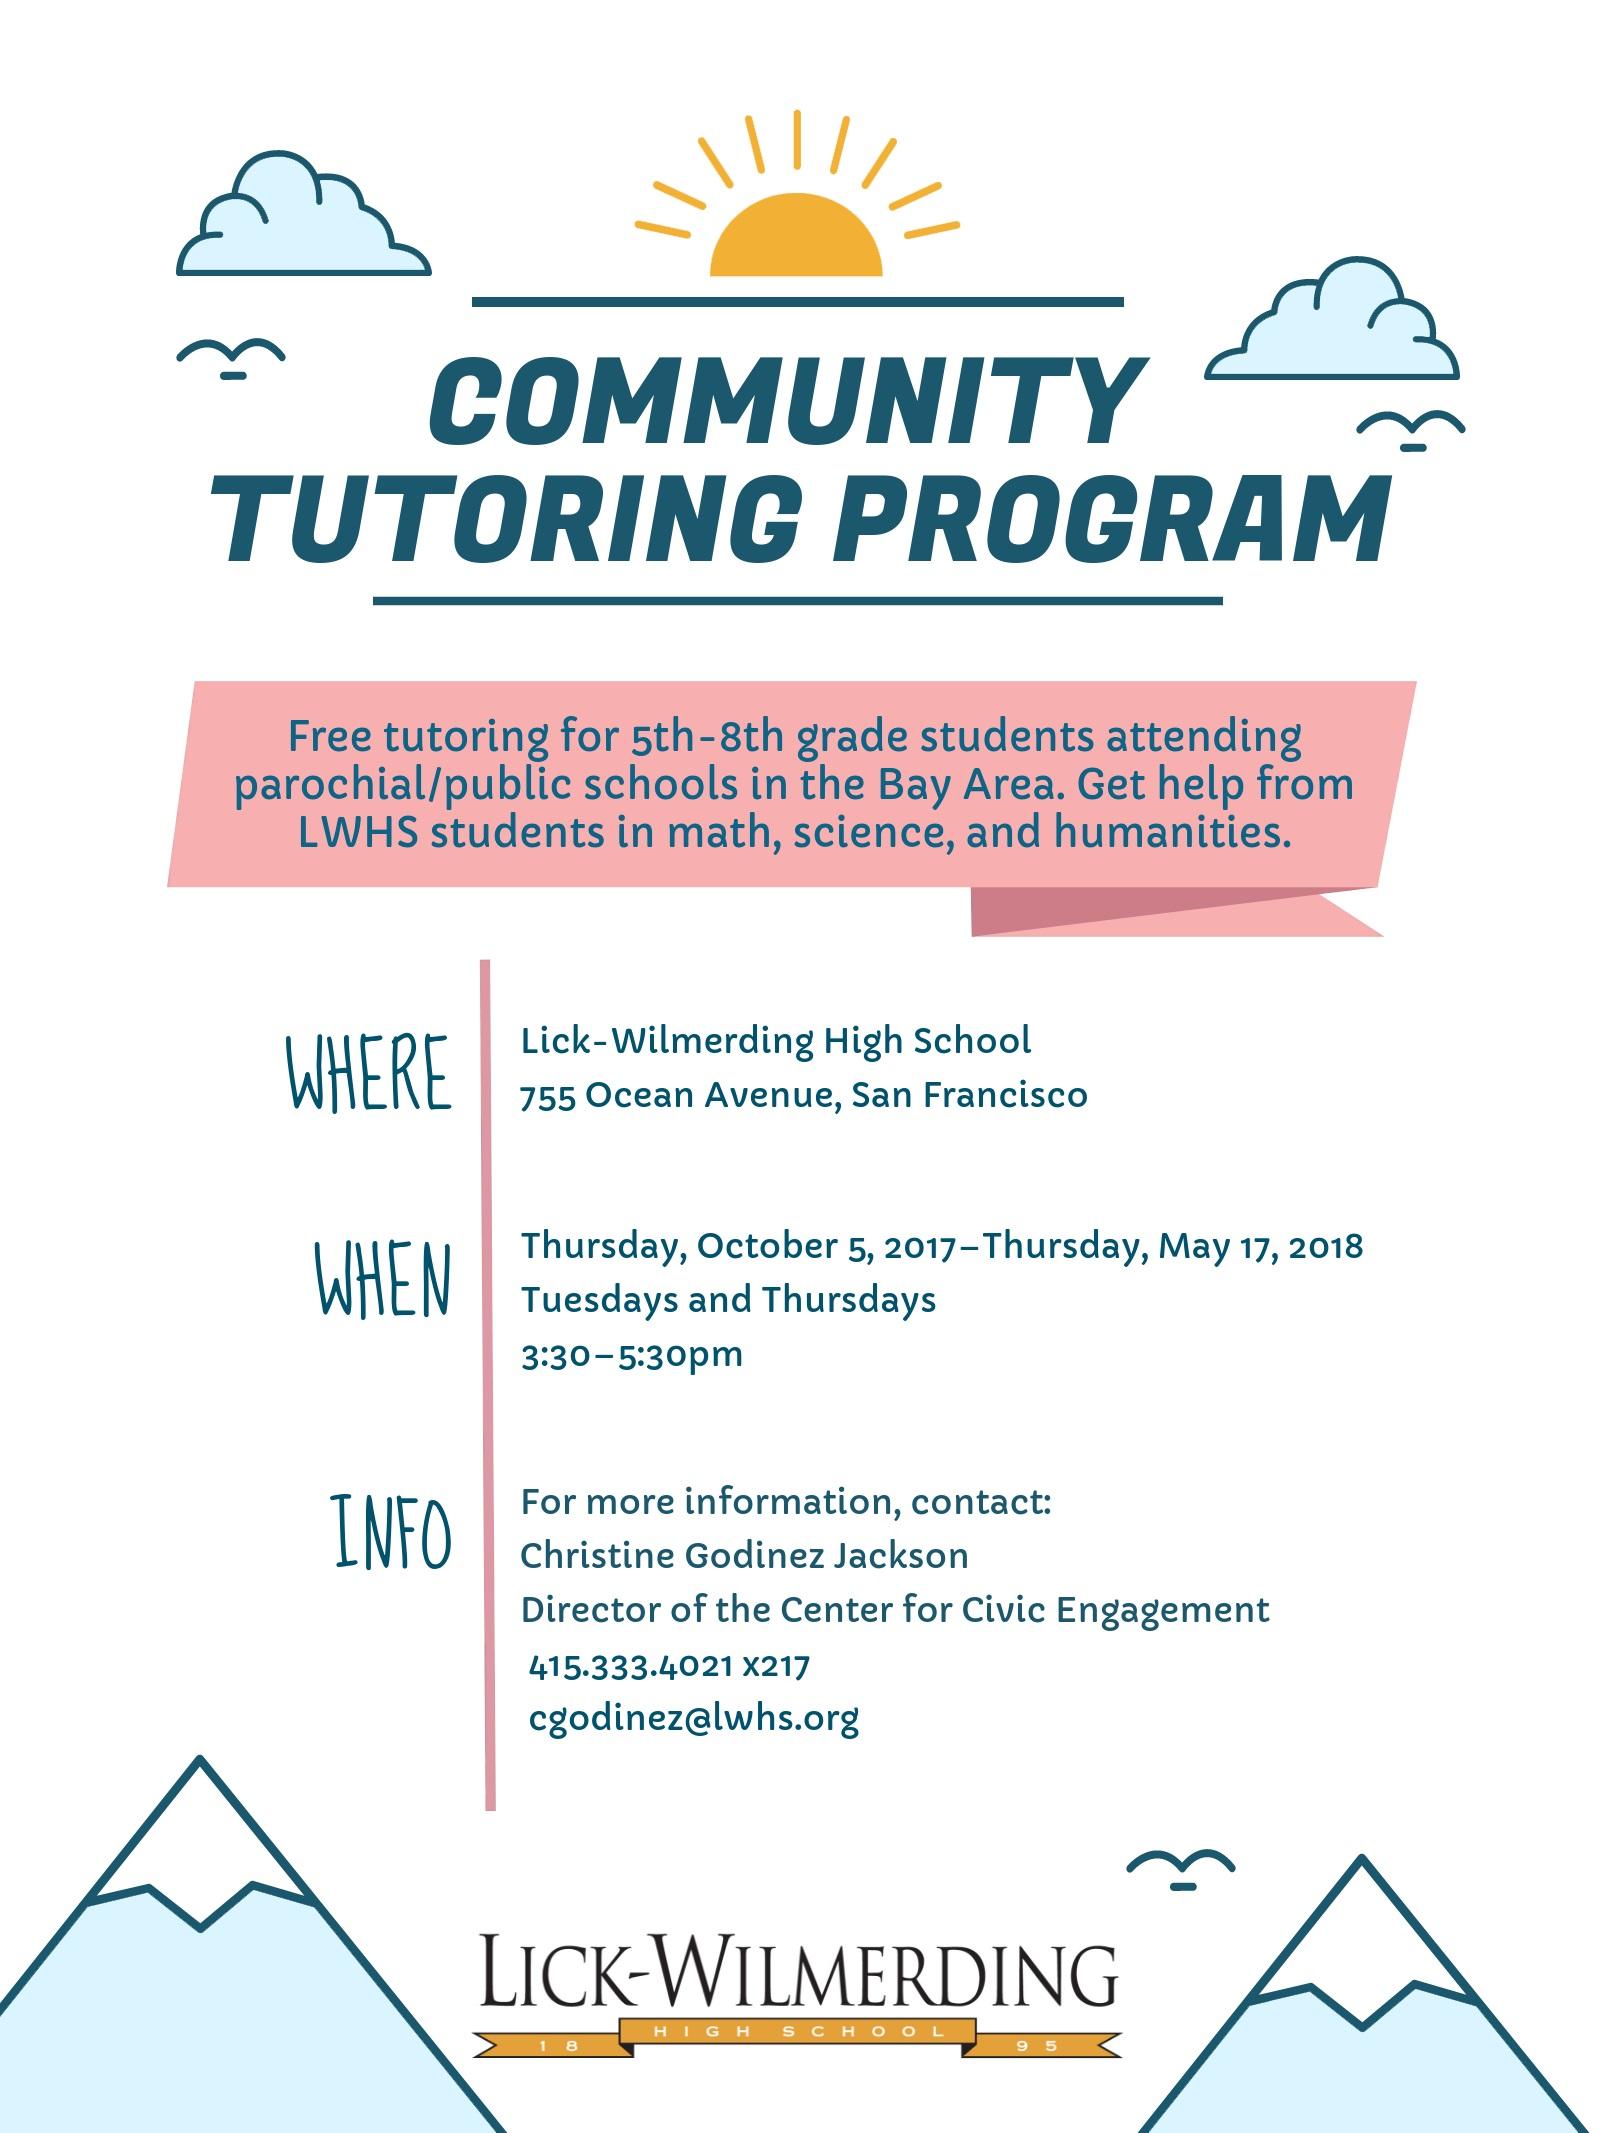 LWHS Community Tutoring Program (1).jpg